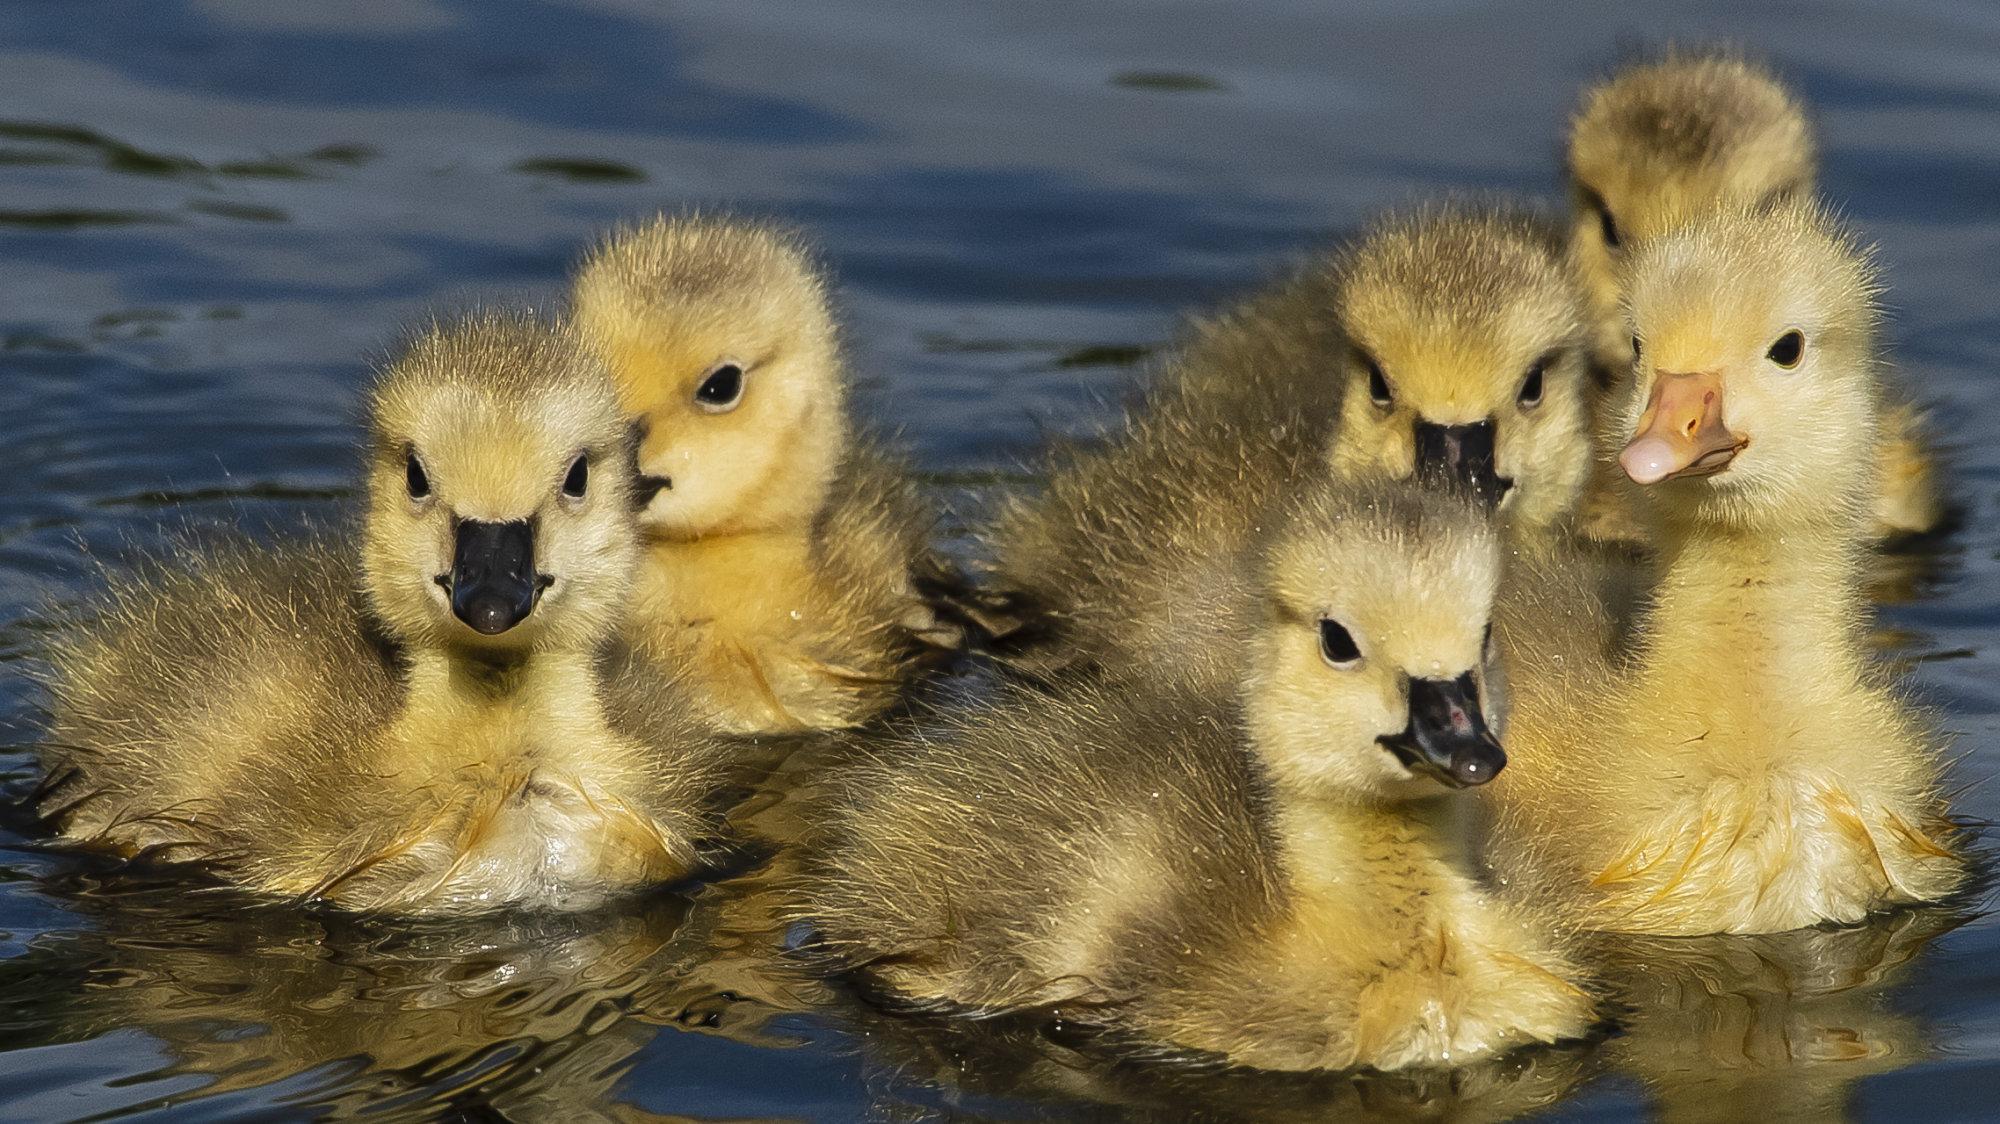 Small Chicks